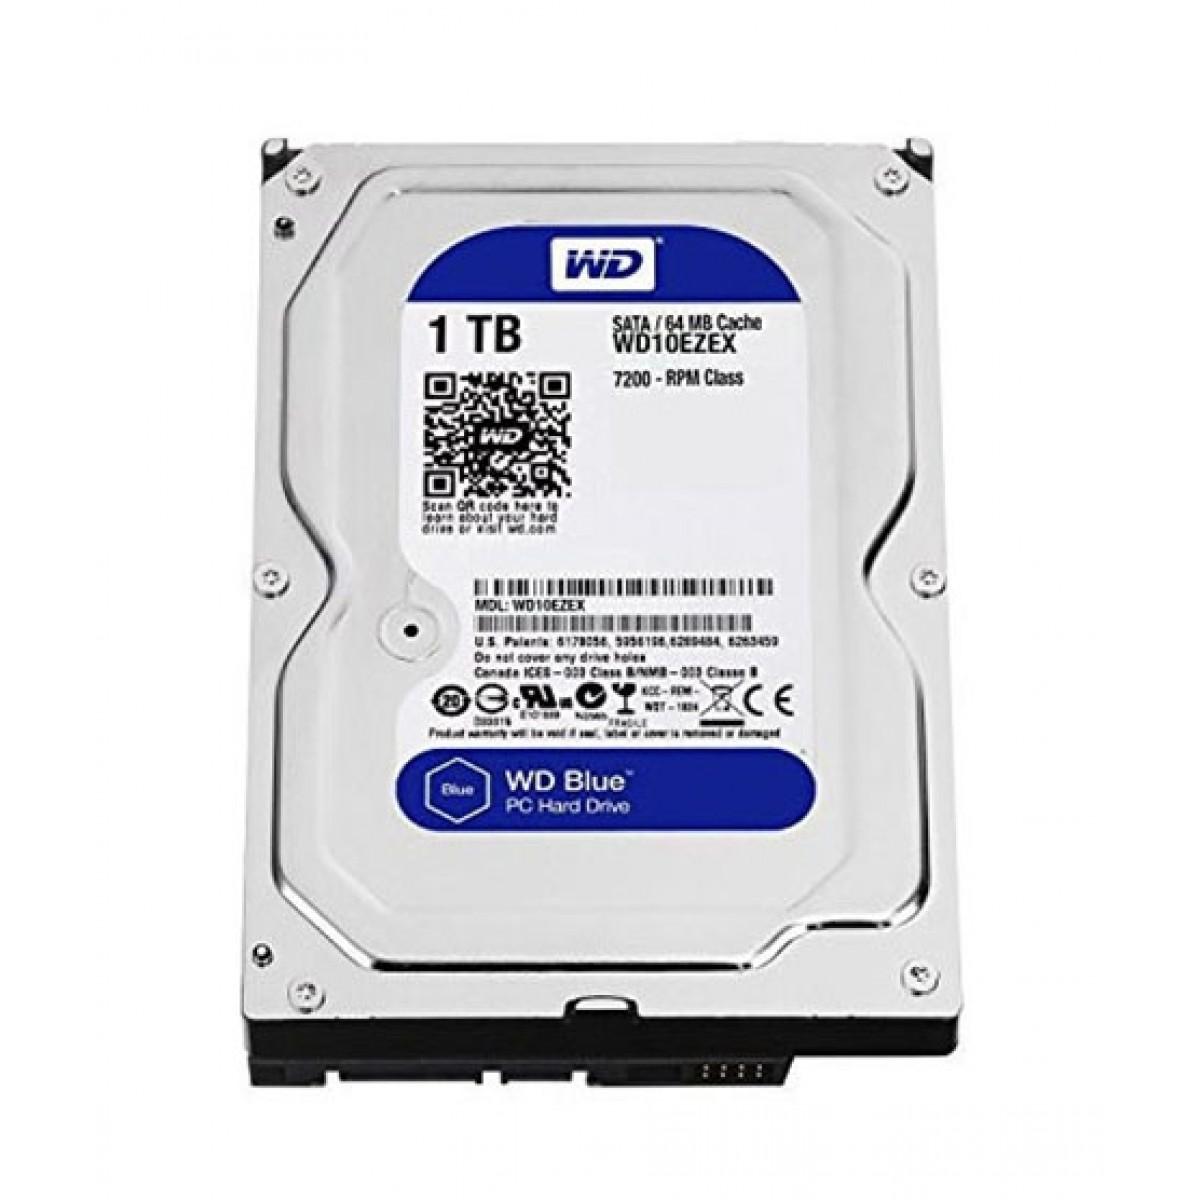 WD Blue 1TB SATA PC Desktop Internal Hard Drive